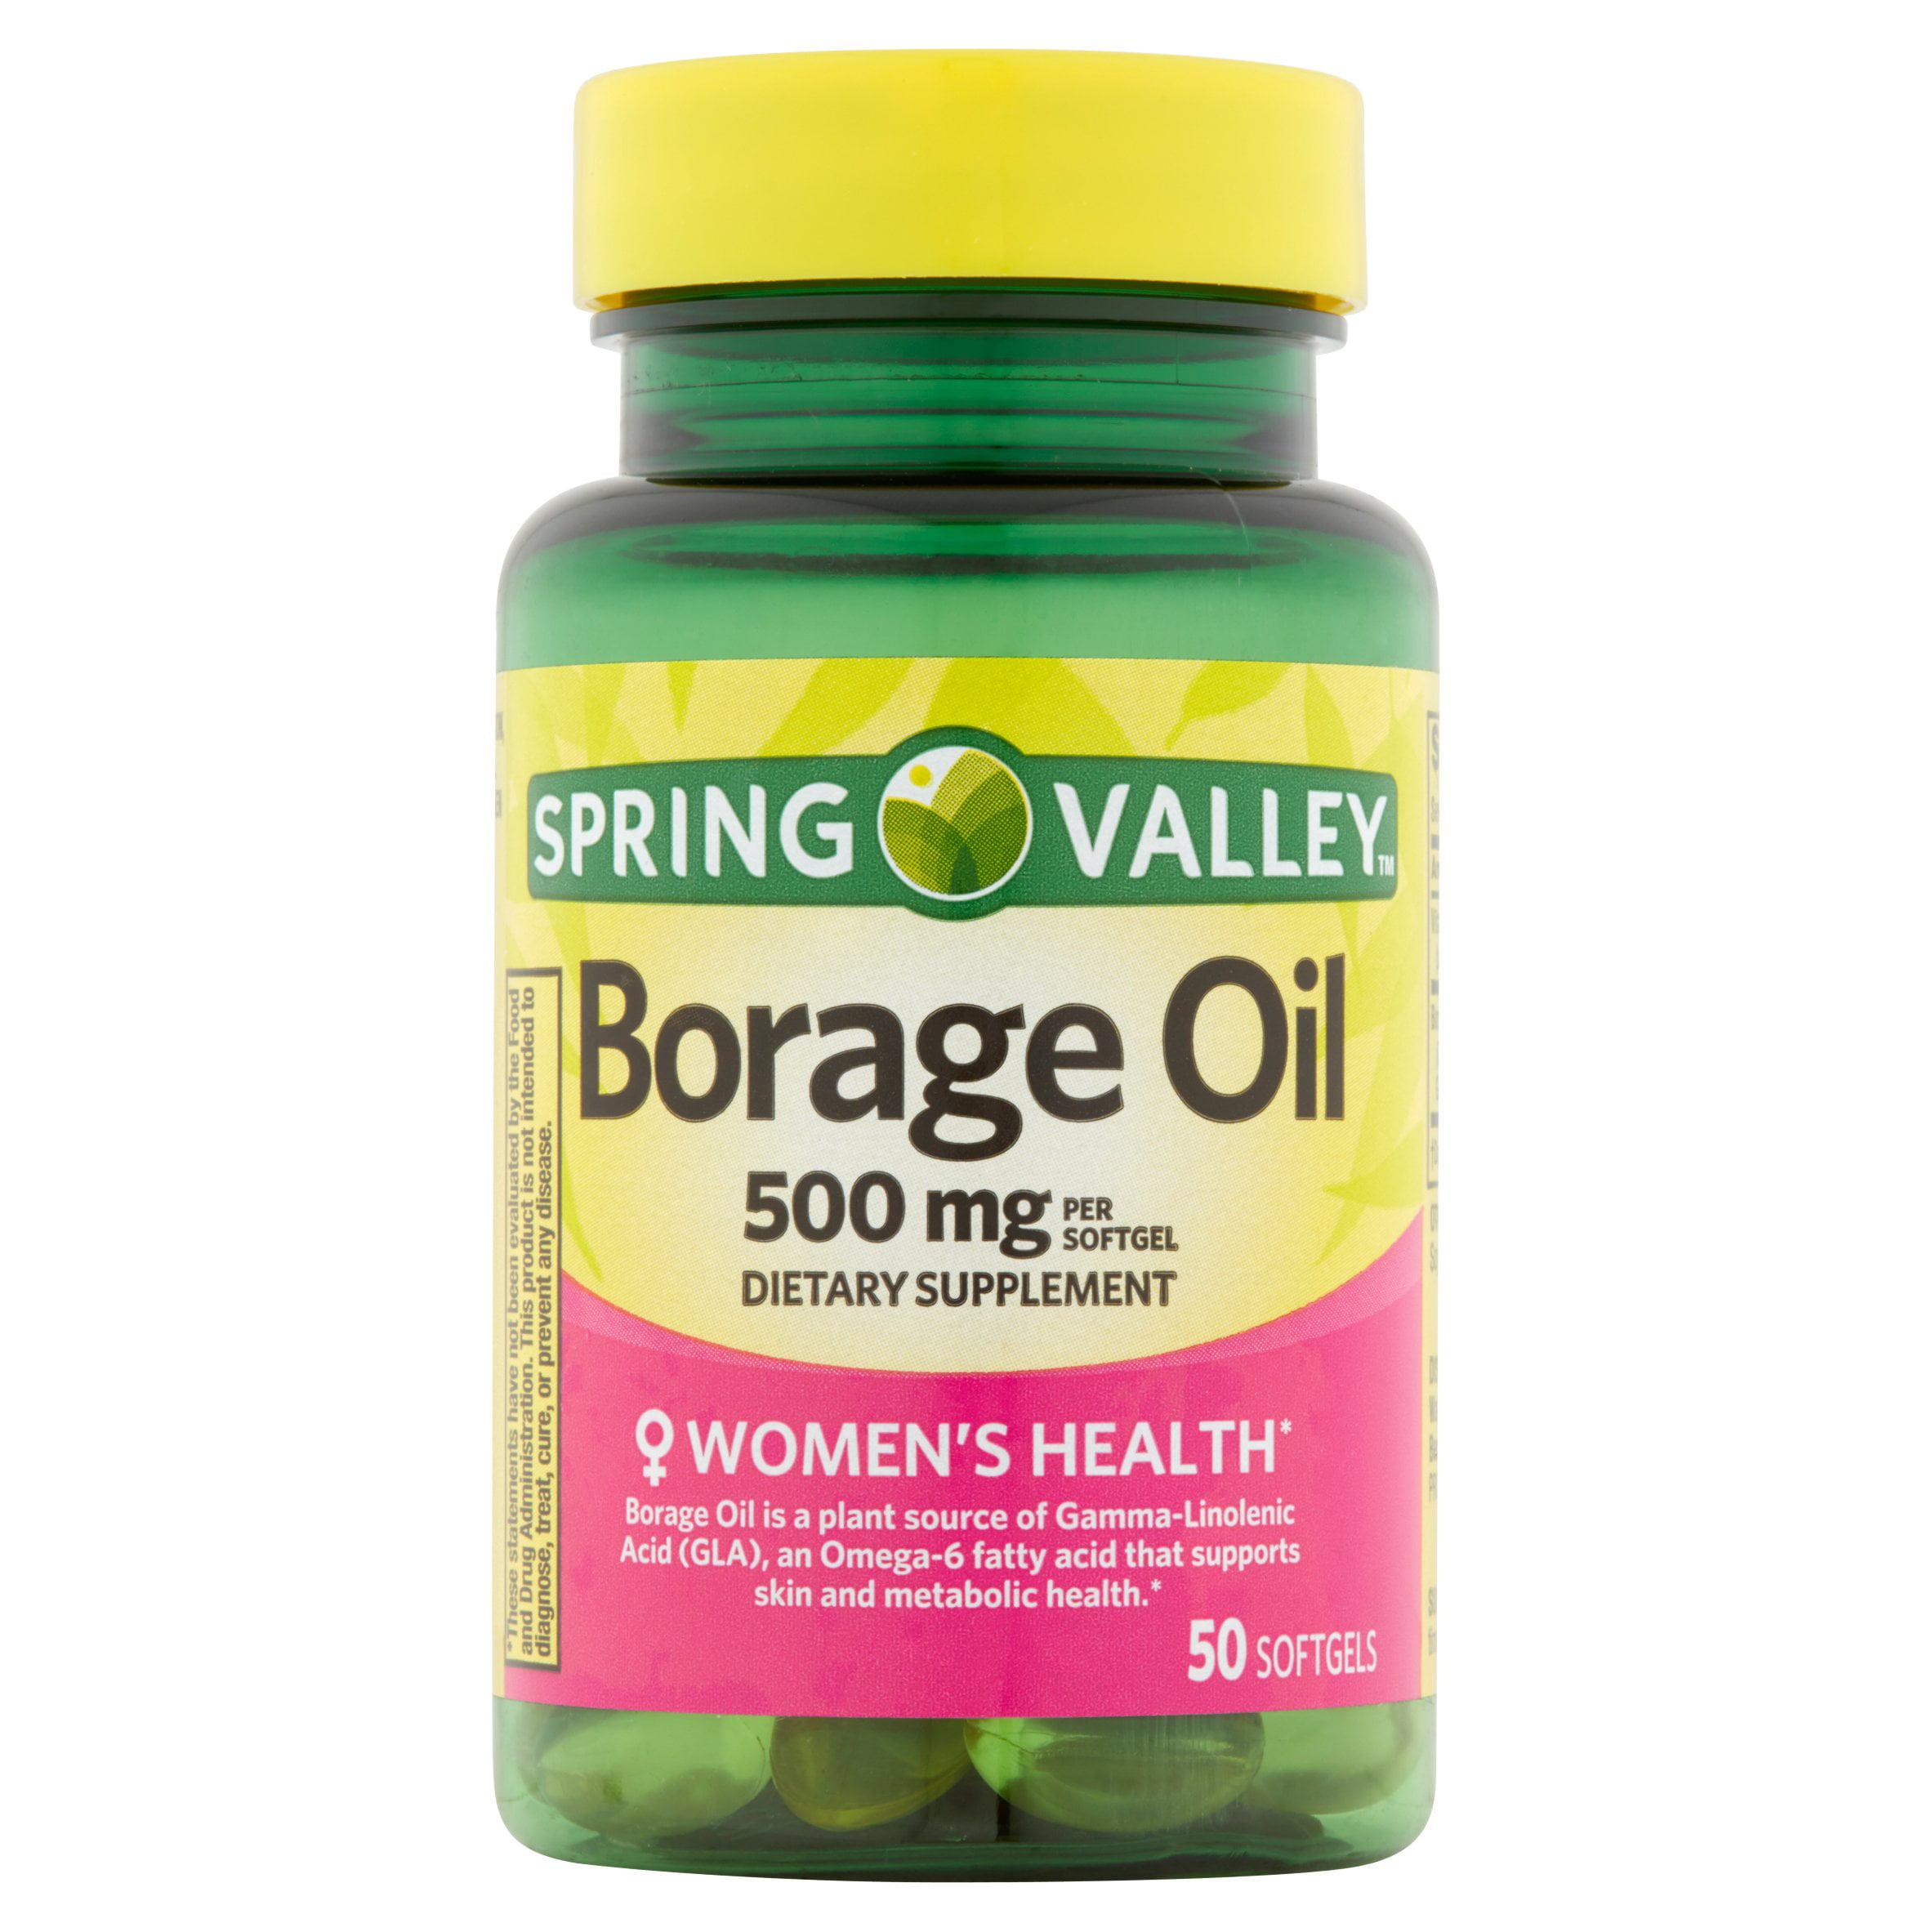 spring valley women's health* borage oil 500 mg per softgel, 50 ct, Skeleton